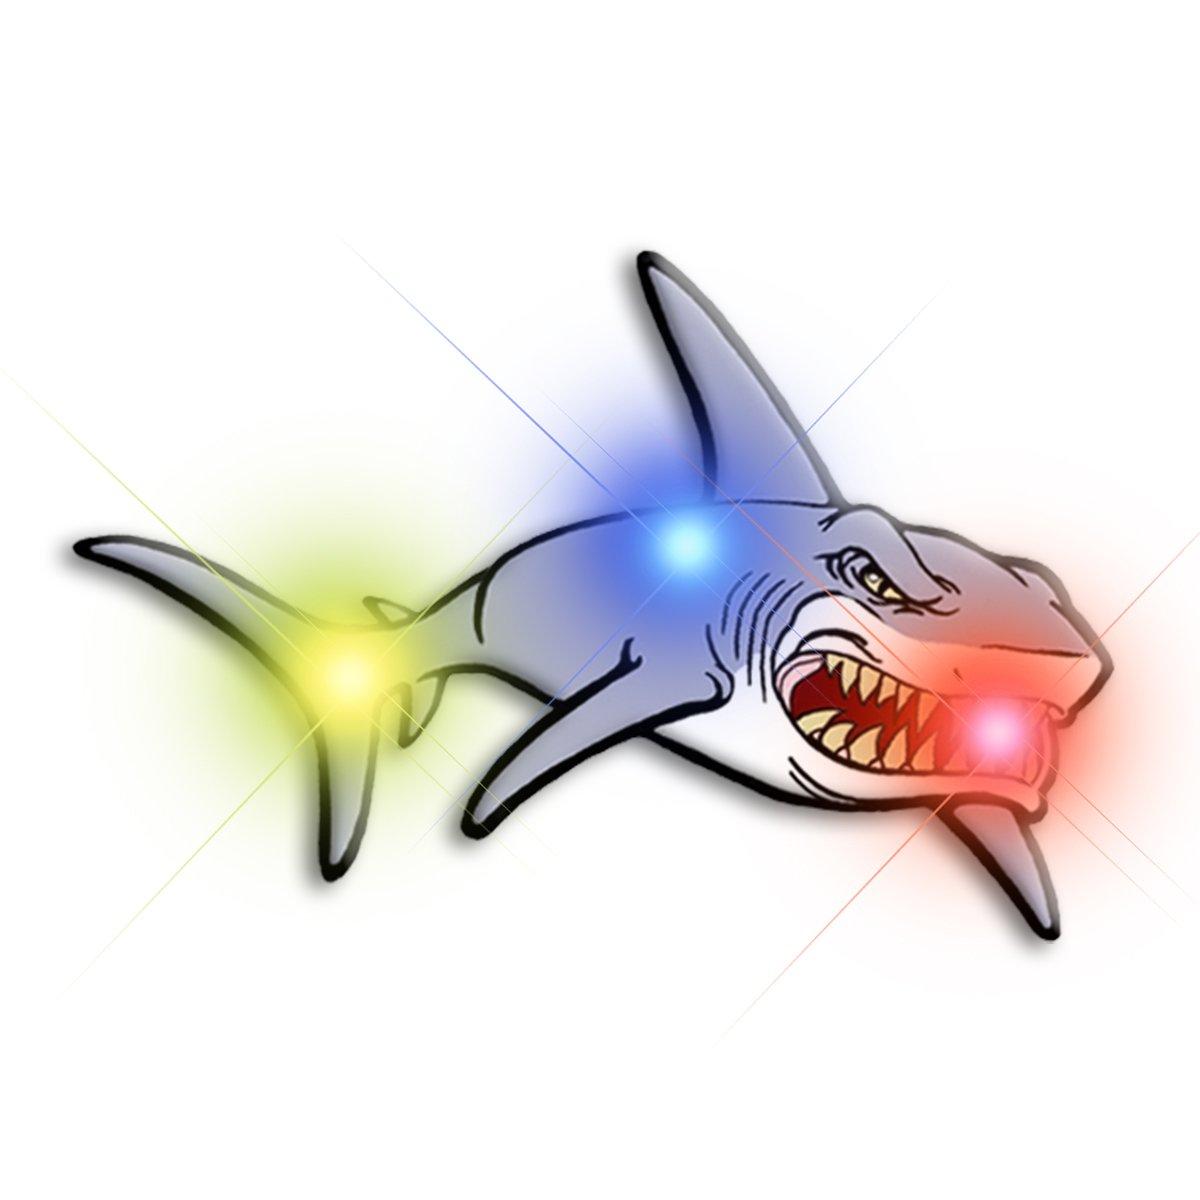 Shark Flashing Body Light Lapel Pins All Body Lights and Blinkees